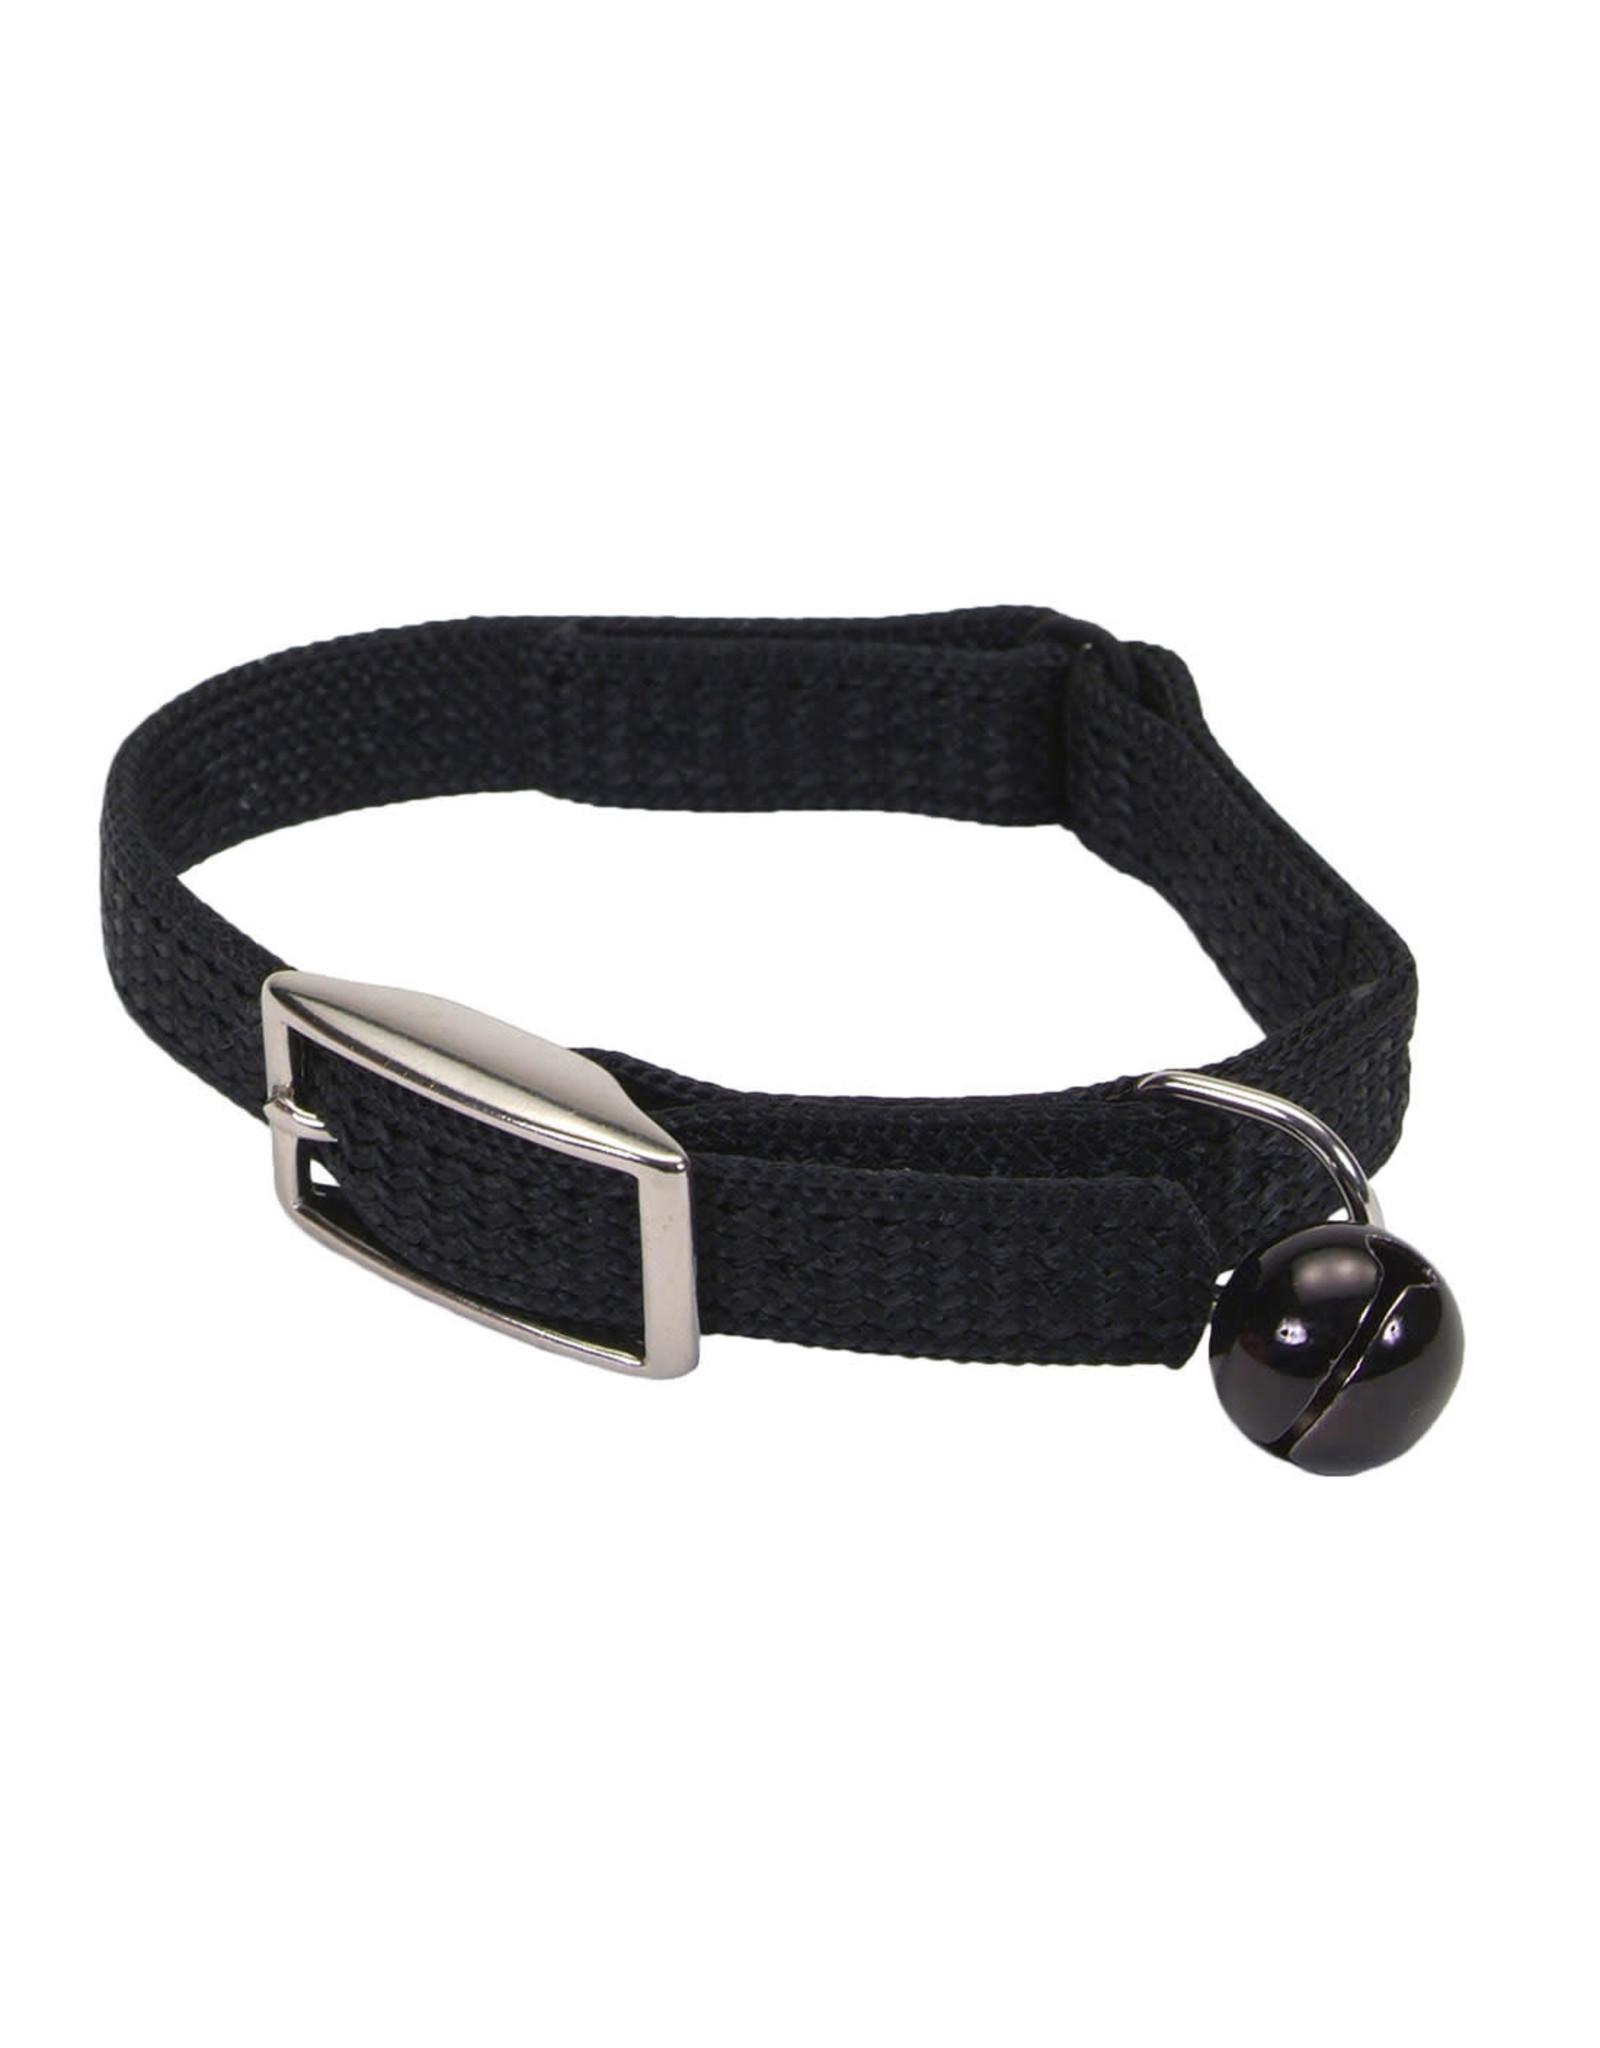 "Coastal Coastal Cat Safety Collar - 10"" Black"